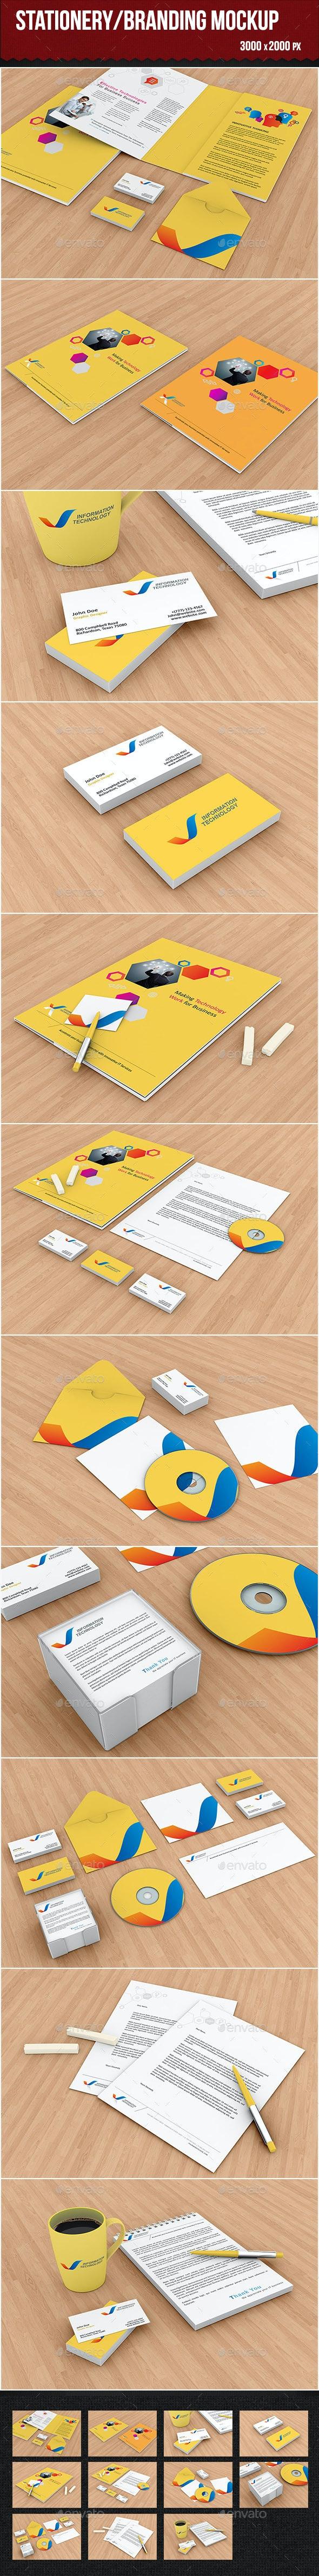 Stationery/Branding Mockup - Product Mock-Ups Graphics